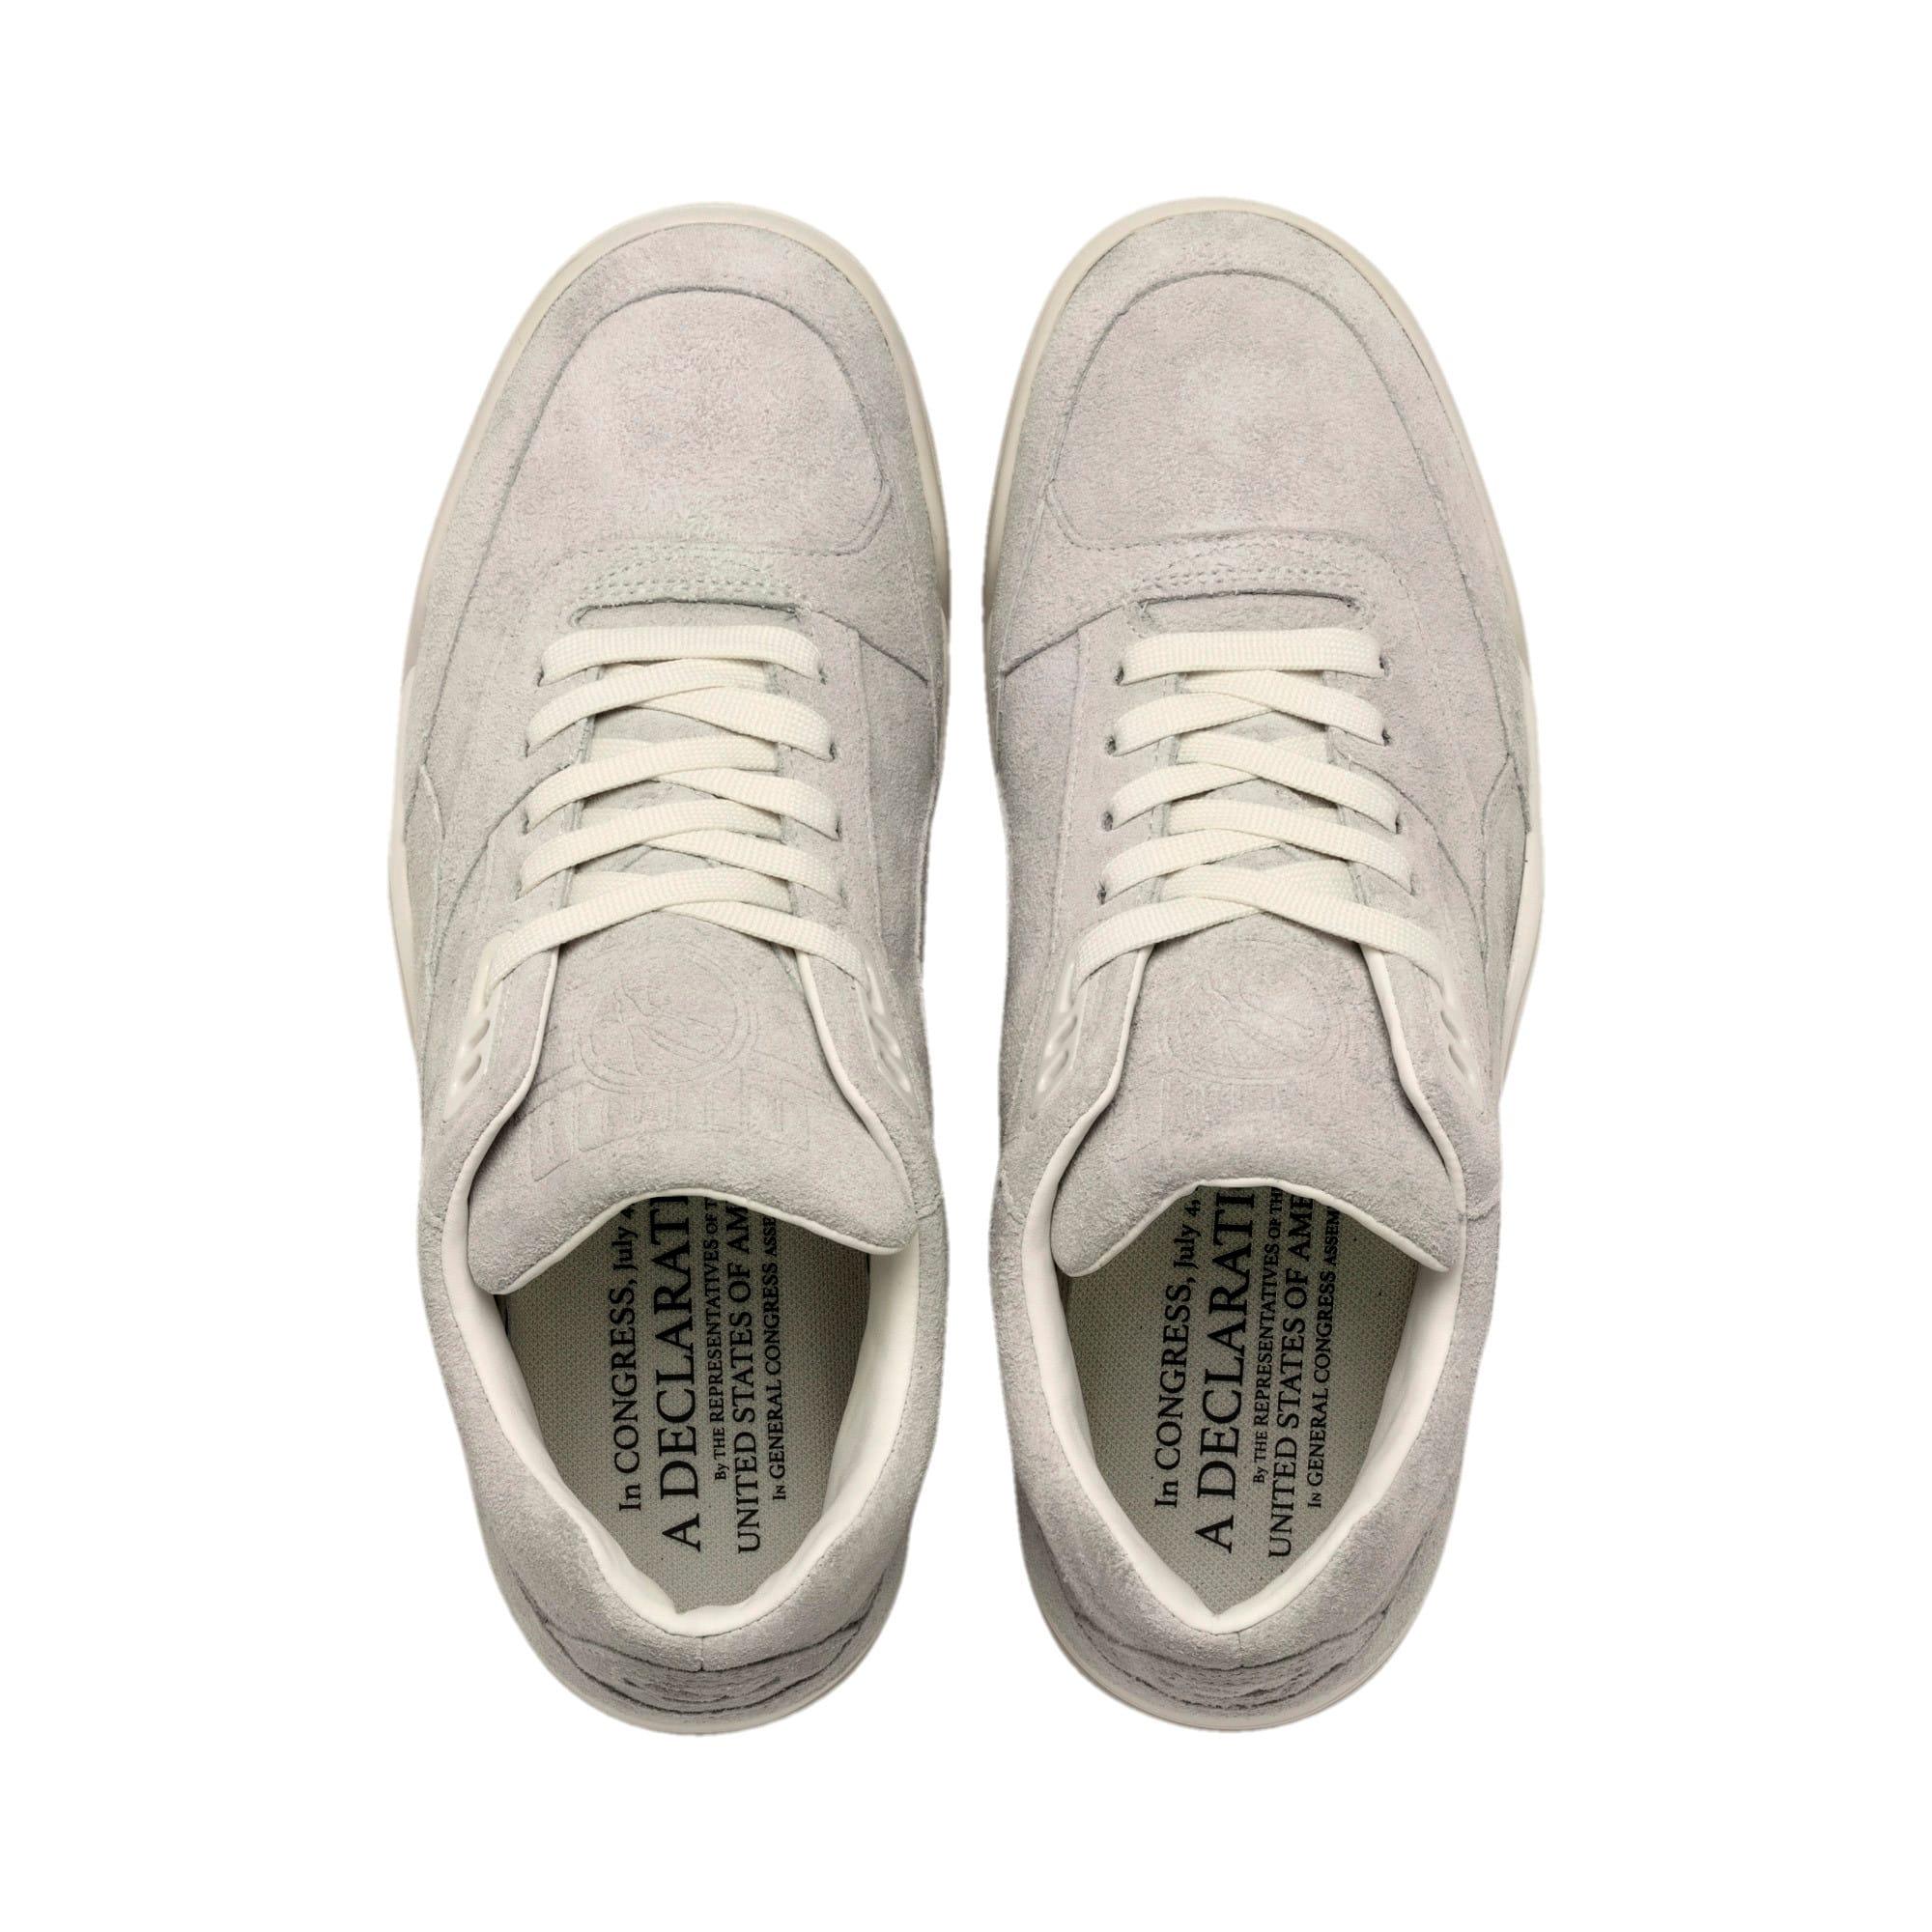 Thumbnail 6 of Palace Guard 4th of July Sneakers, Whisper White-Puma Black, medium